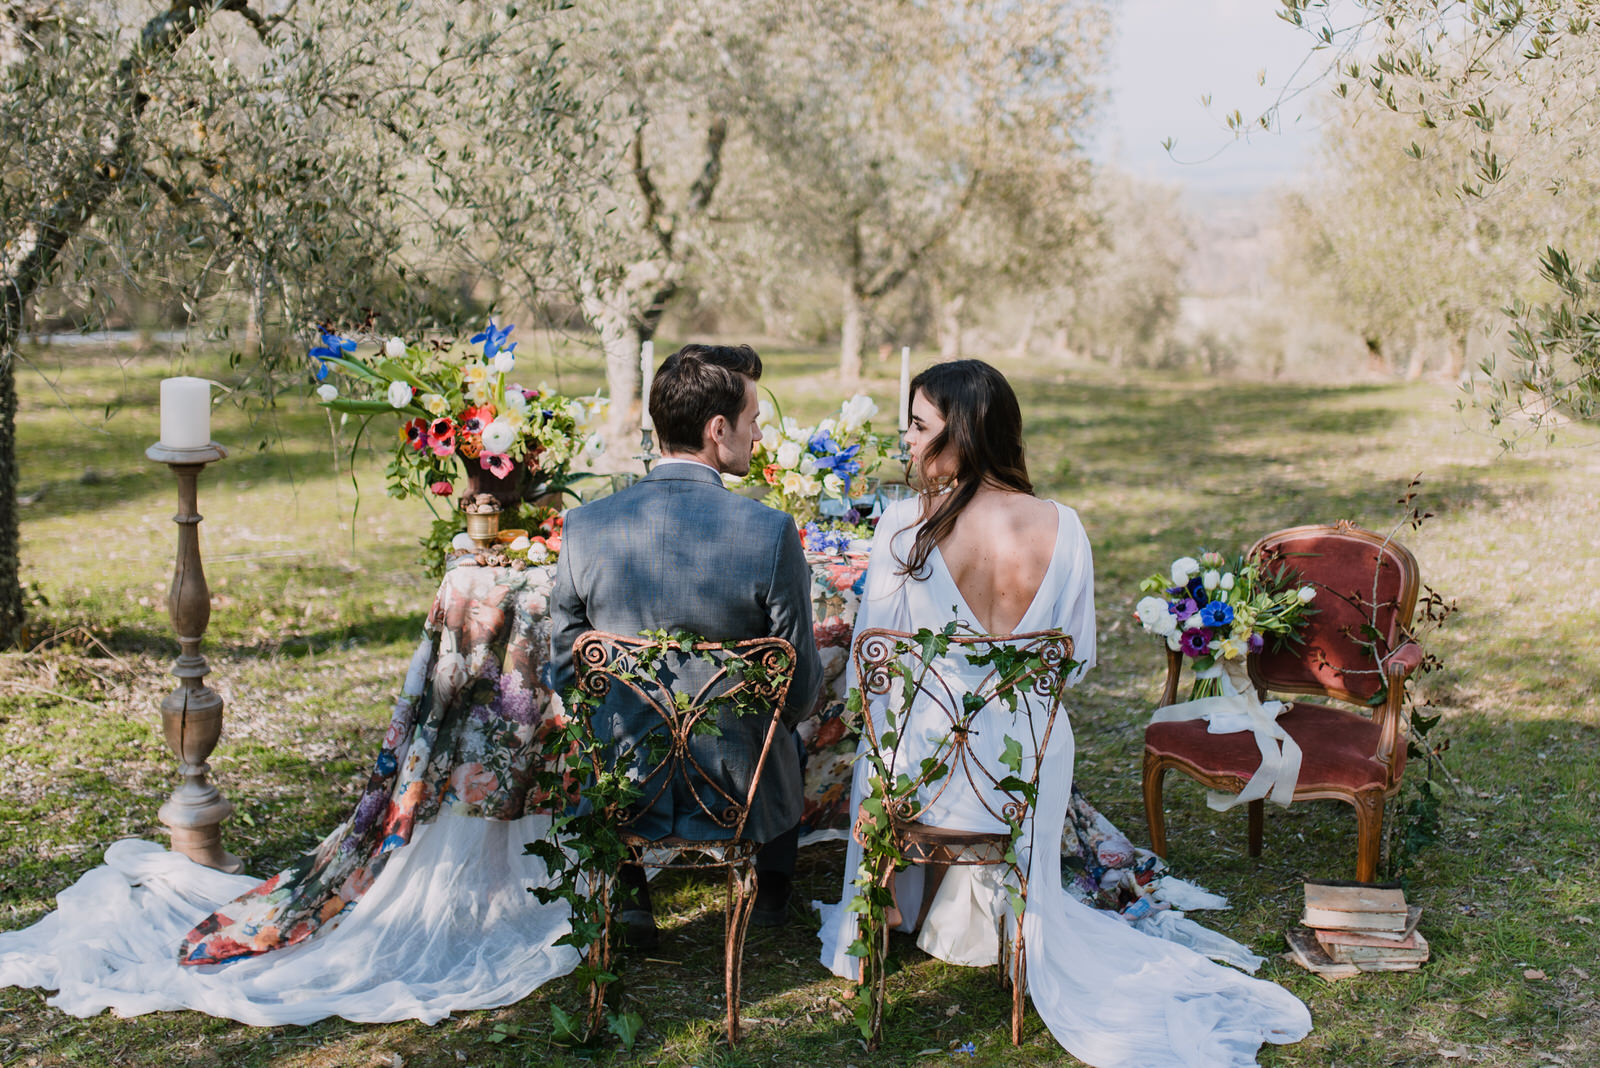 tuscany wedding photography 45.jpg